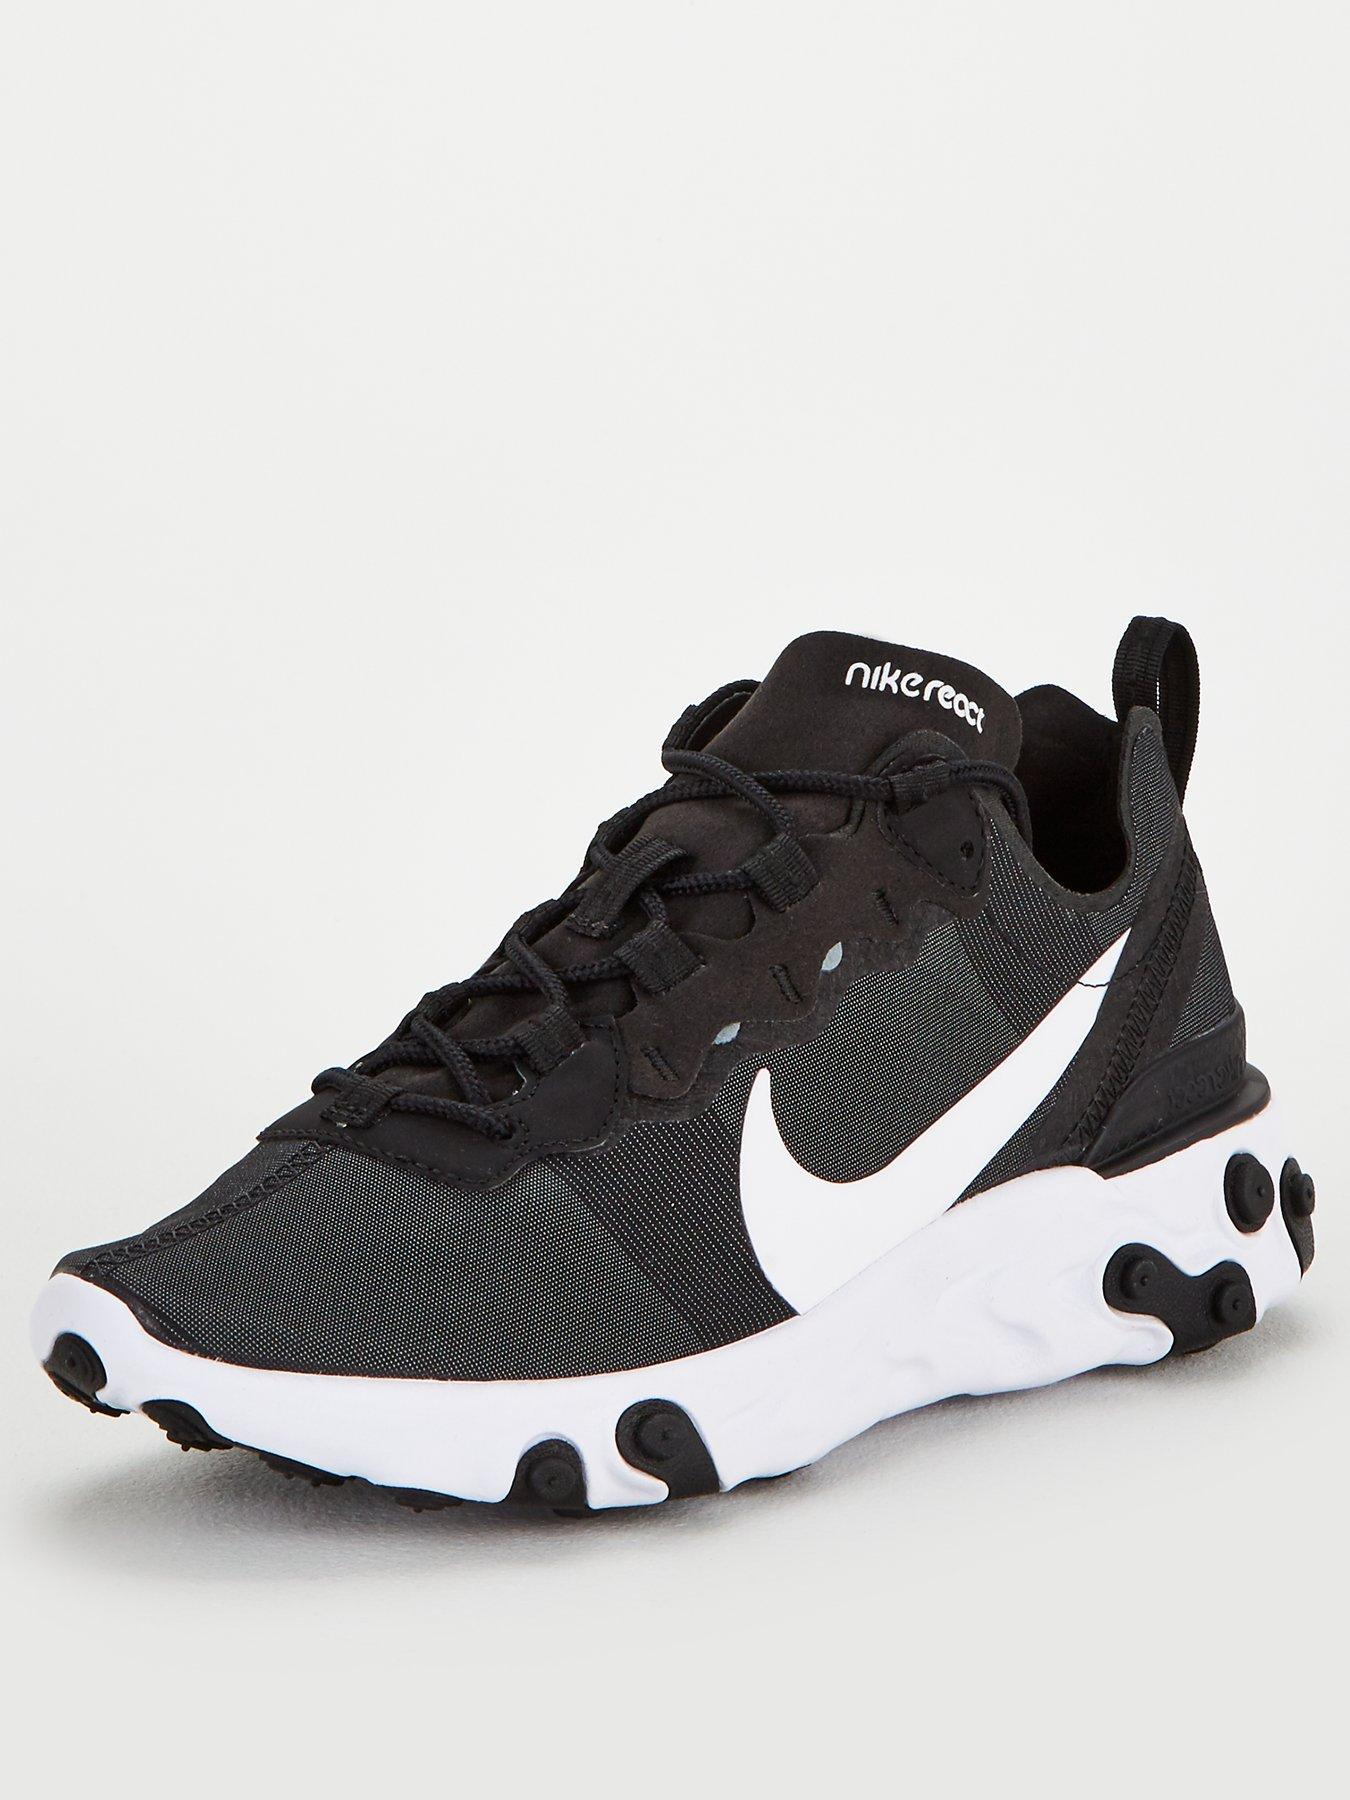 Womens Trainers   Nike, Puma adidas